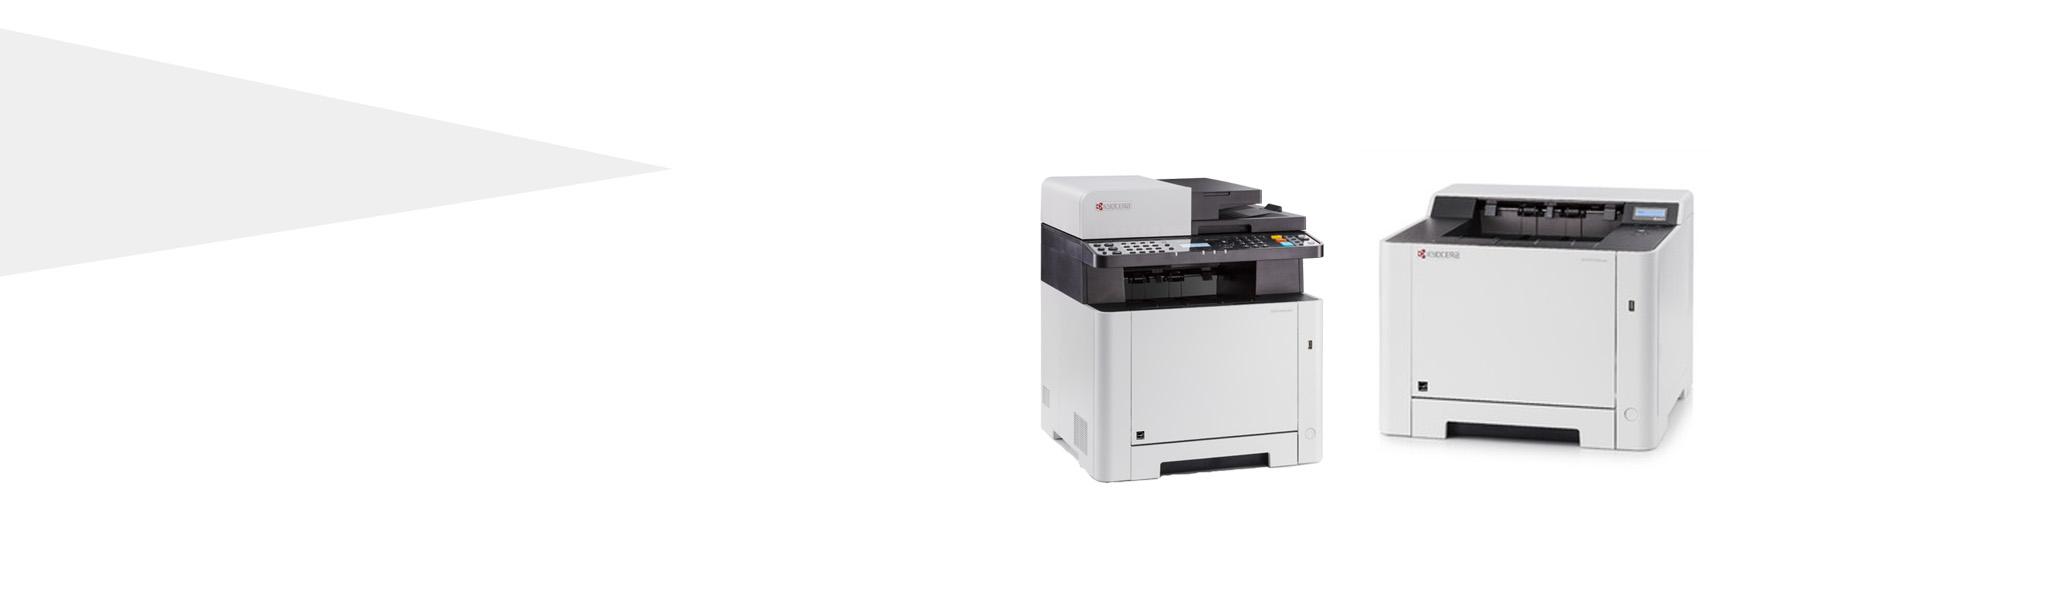 Kyocera Printers | Colour Printers | Black & White Printers